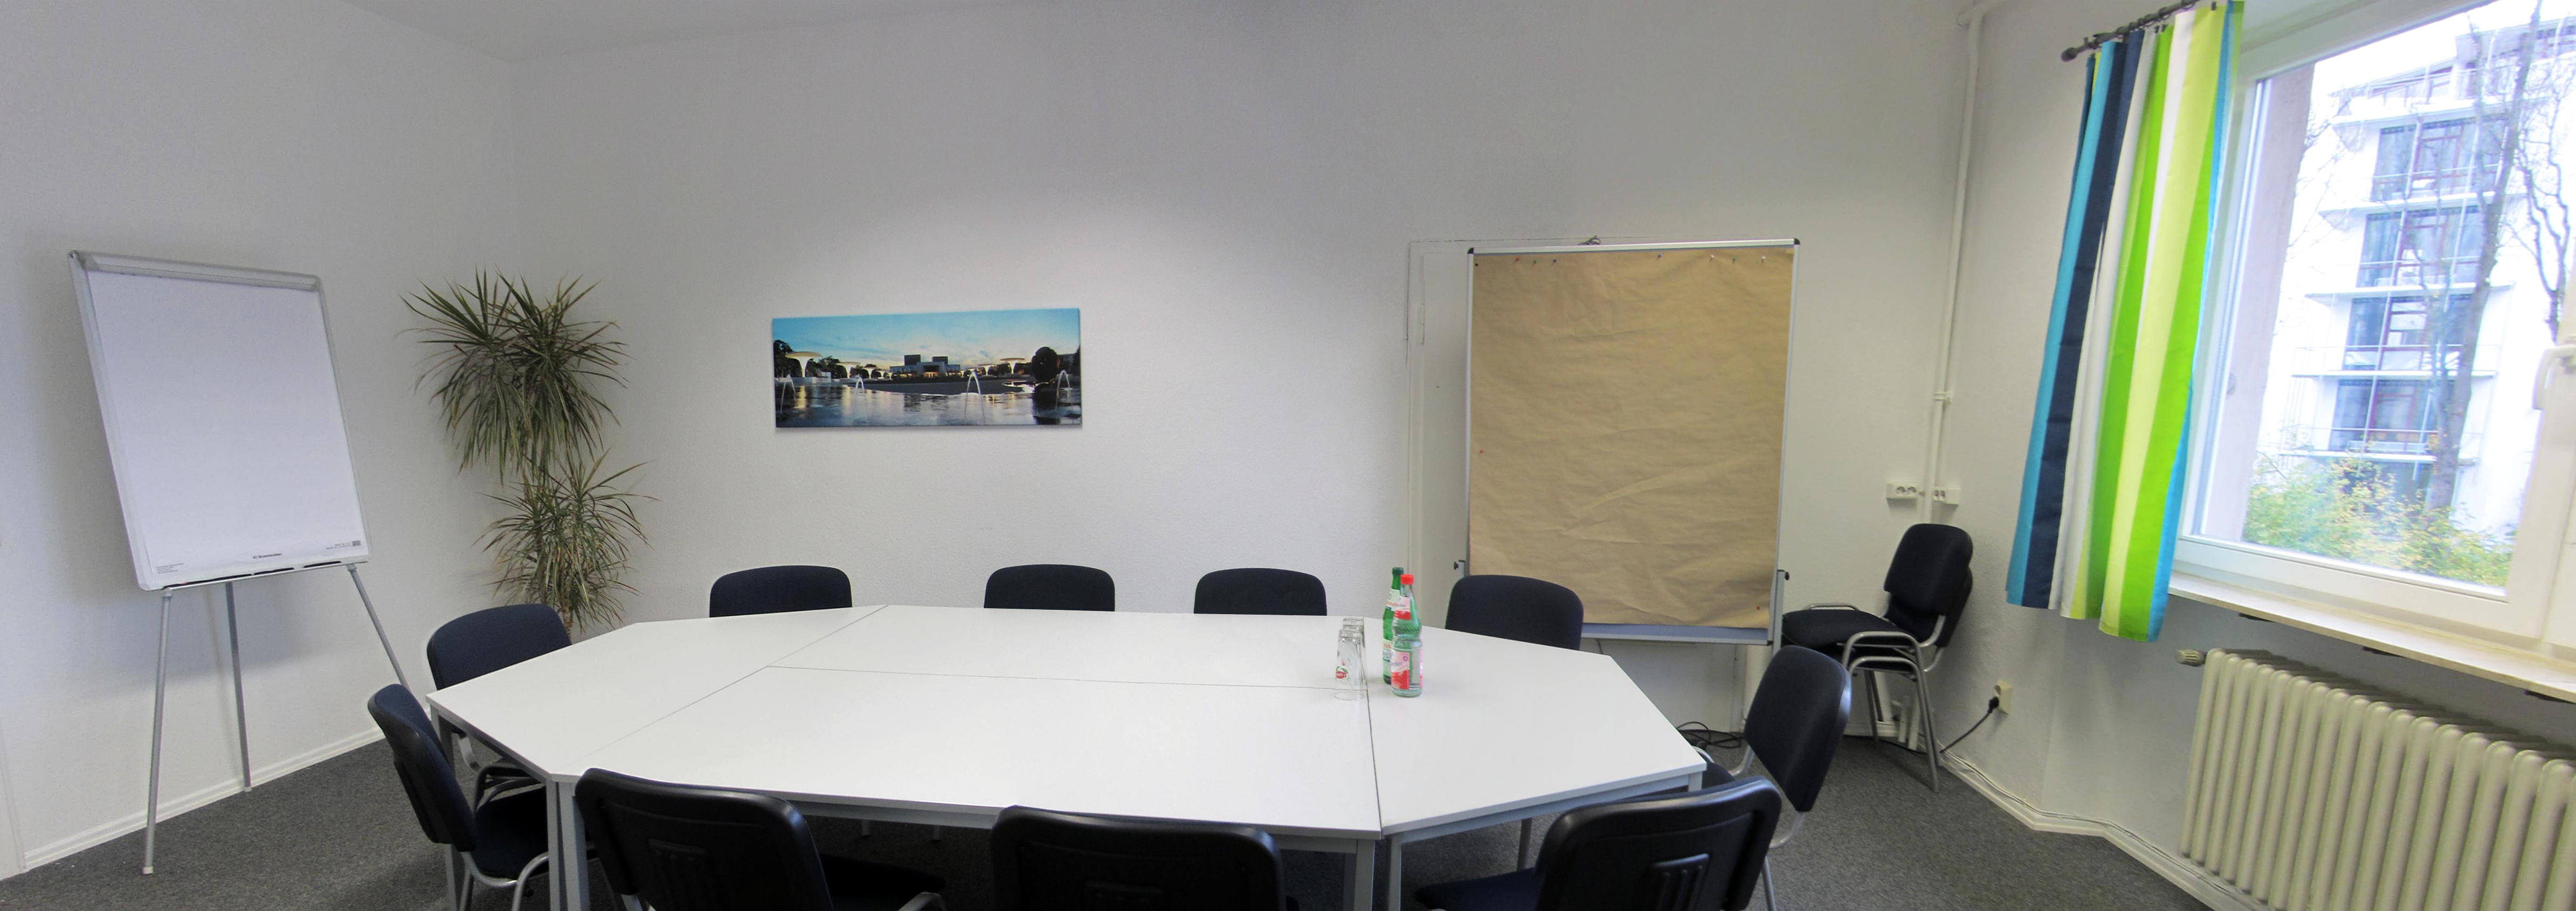 Meetingraum-nachher1